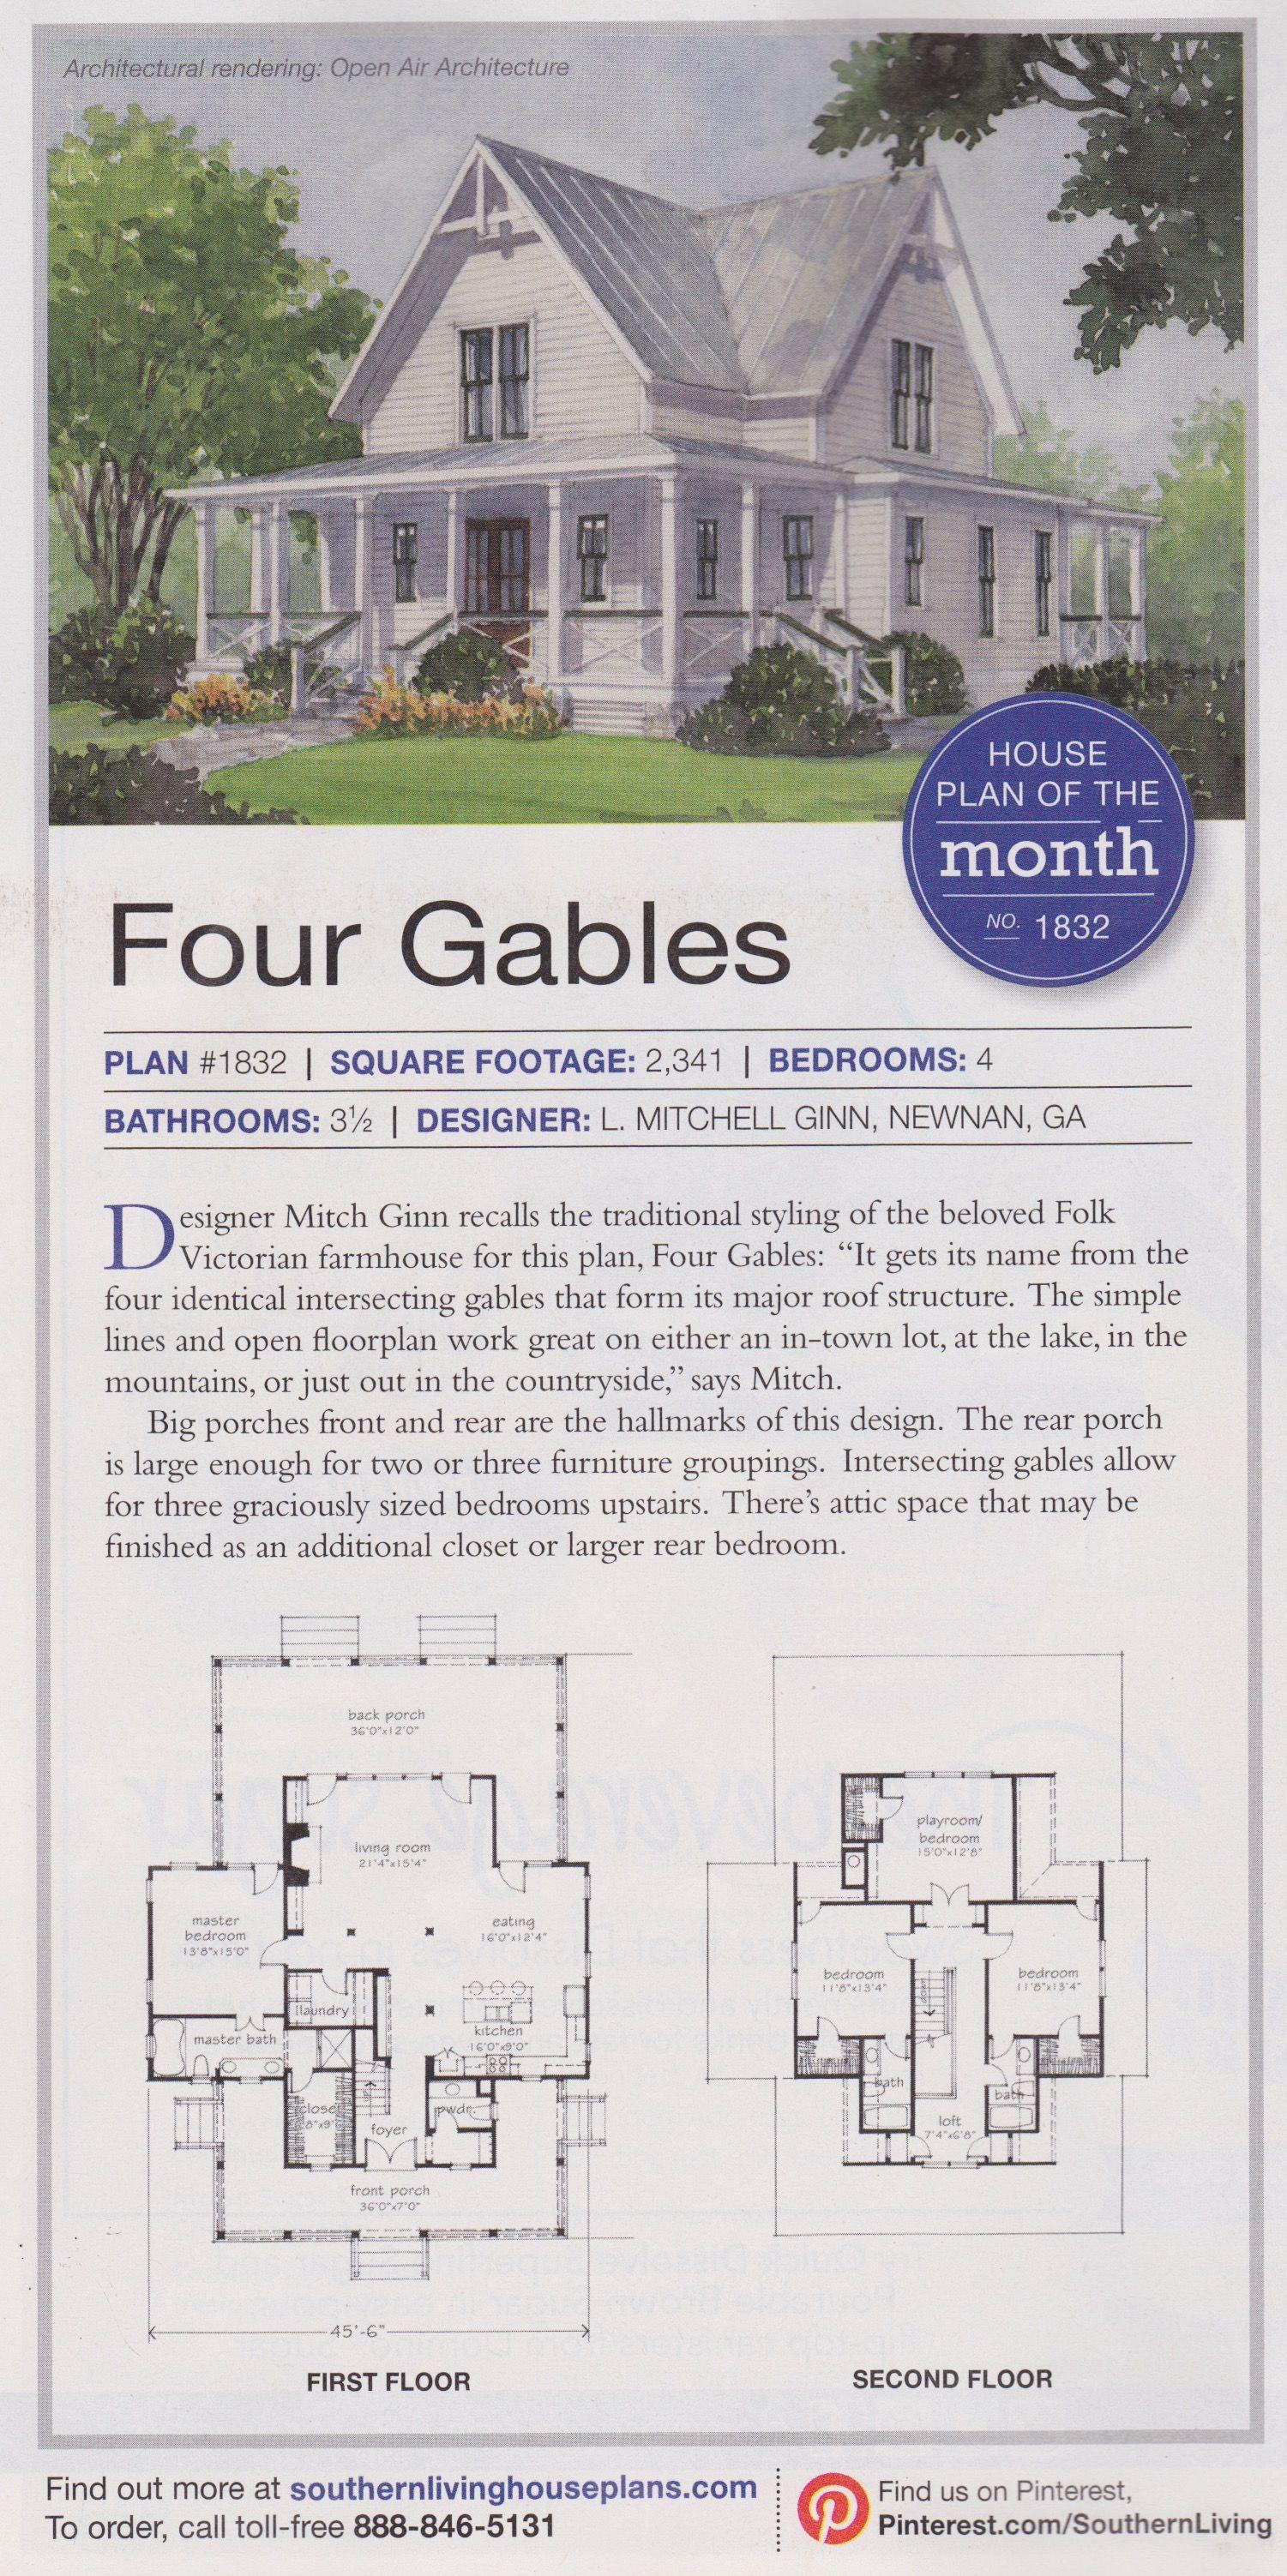 Four Gables